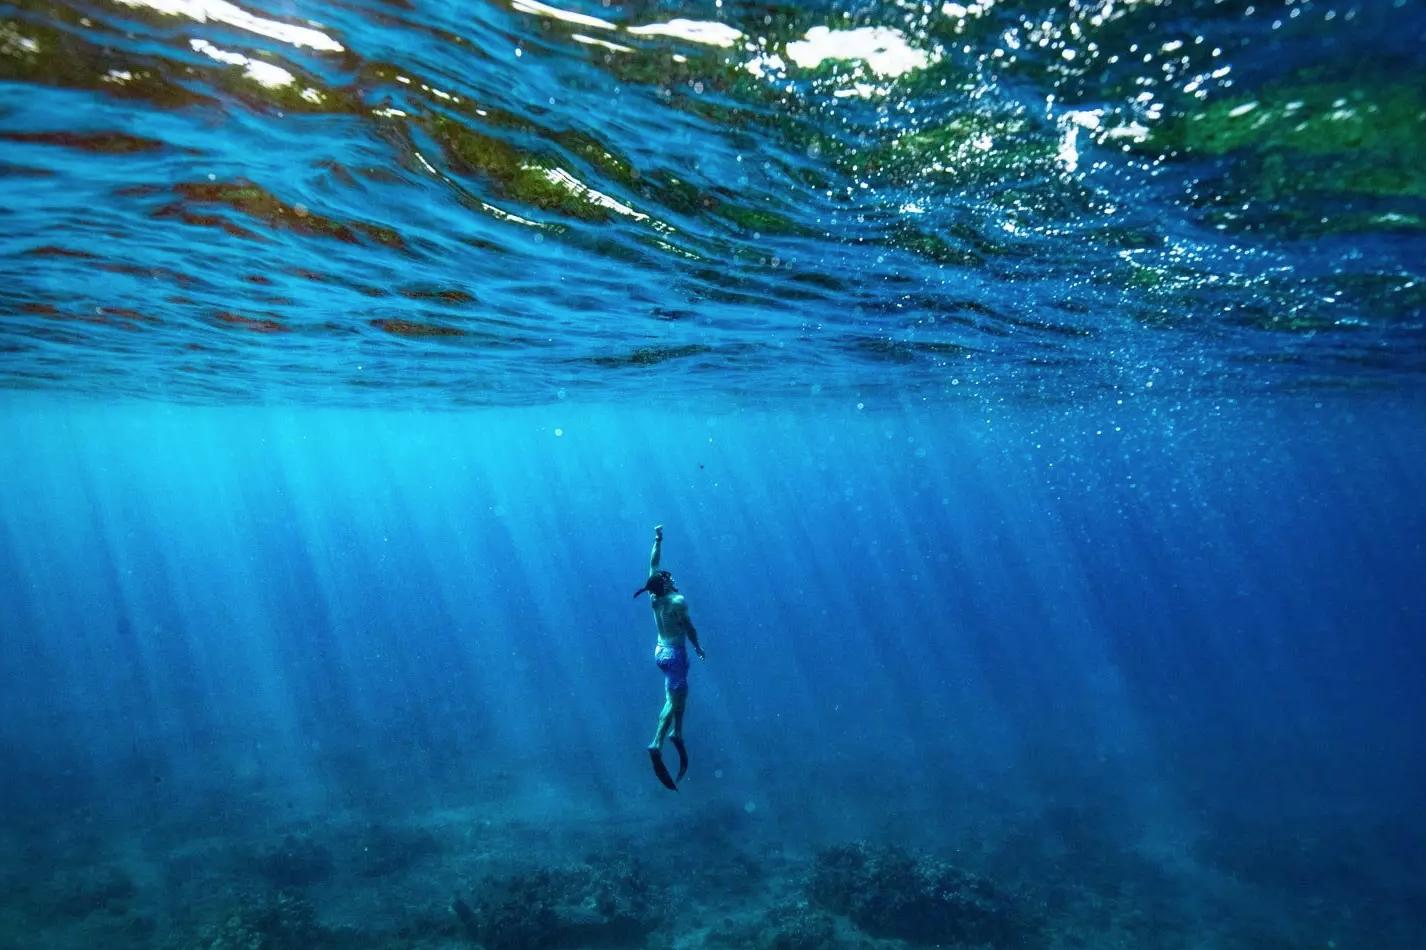 Underwater travel photographs